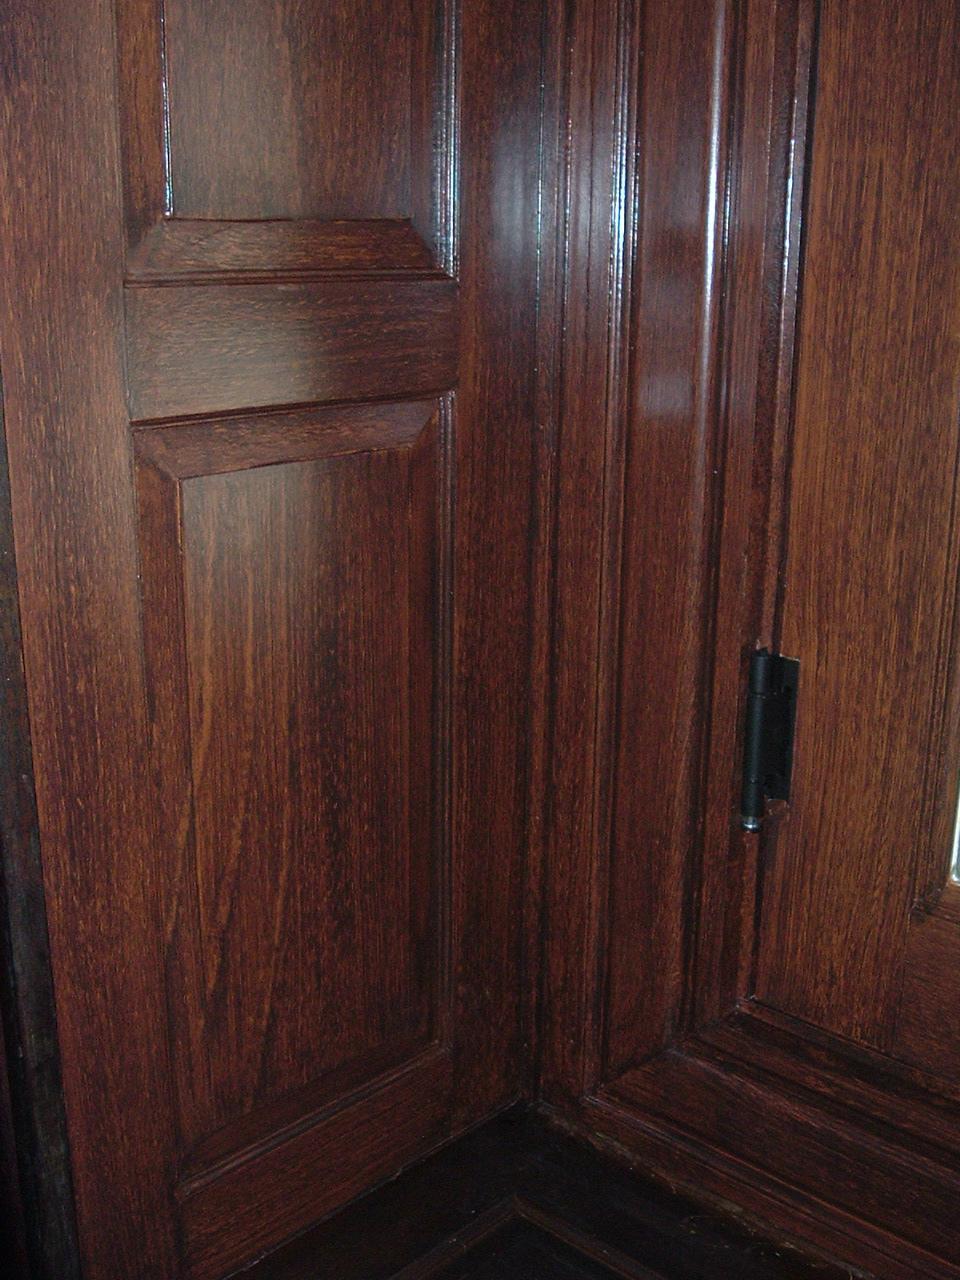 Faux wood grain,  private residence, Philadelphia, PA